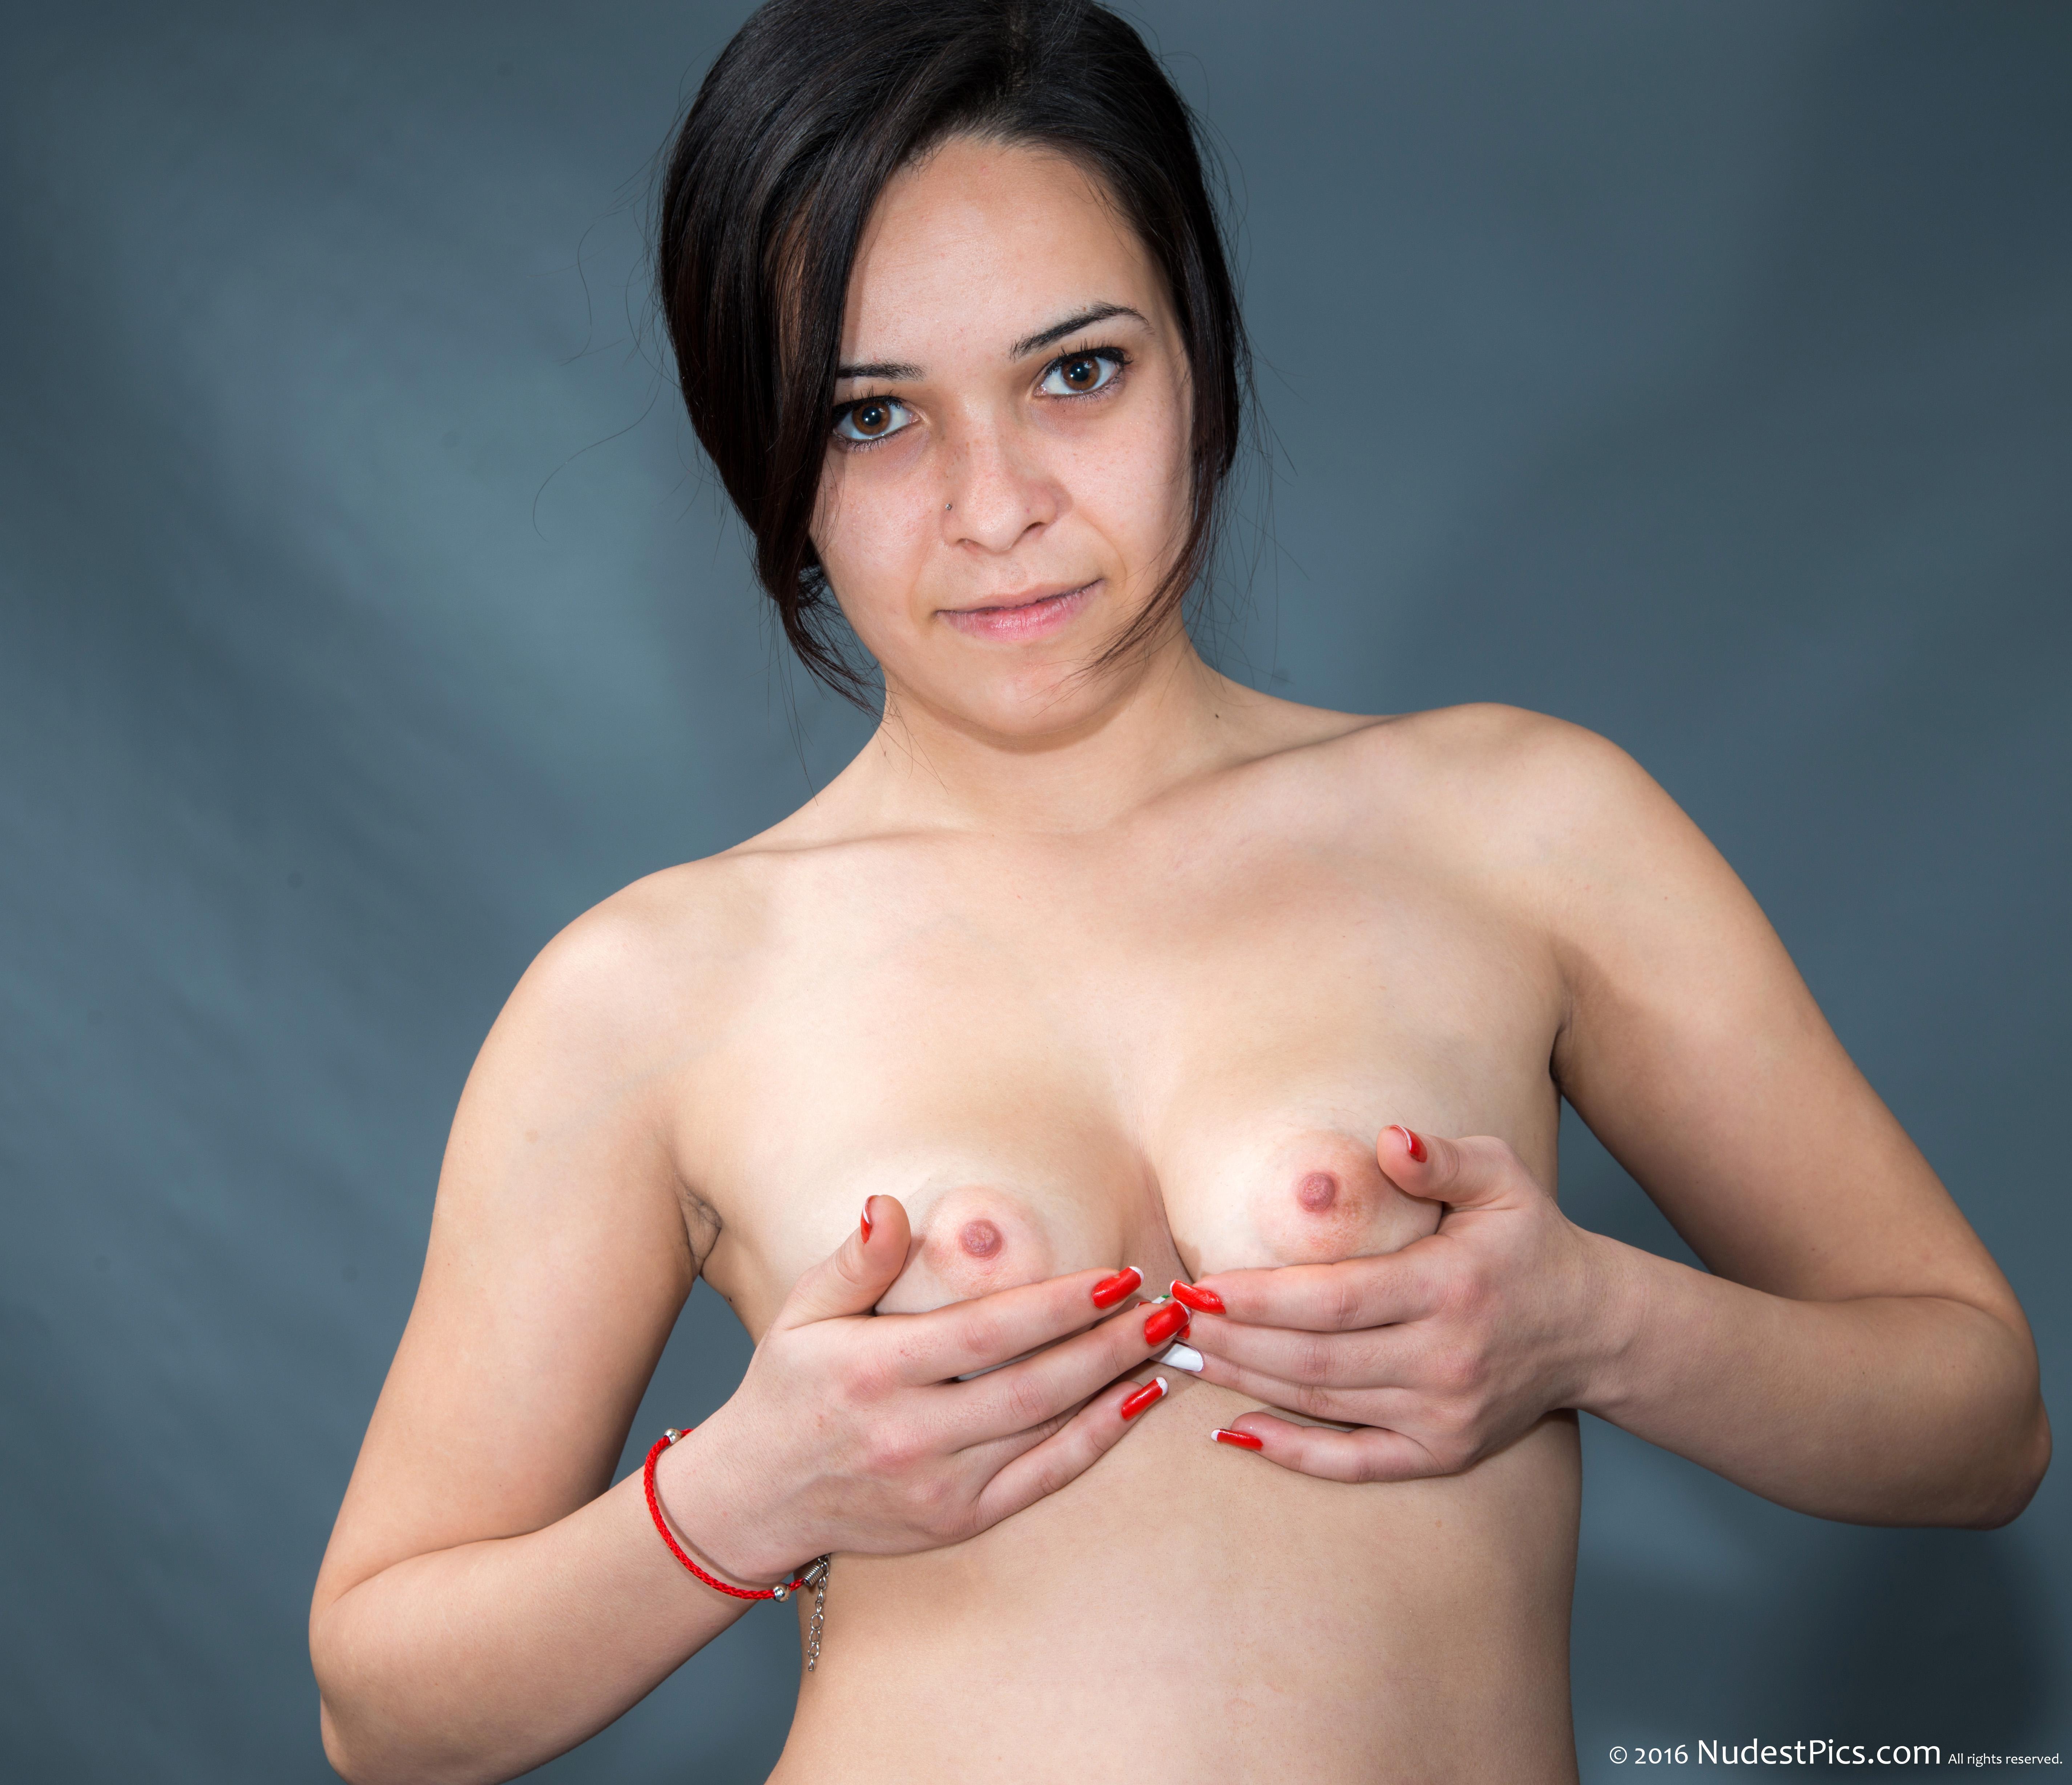 Romanian Teen Girl Holding Small Tits full HD